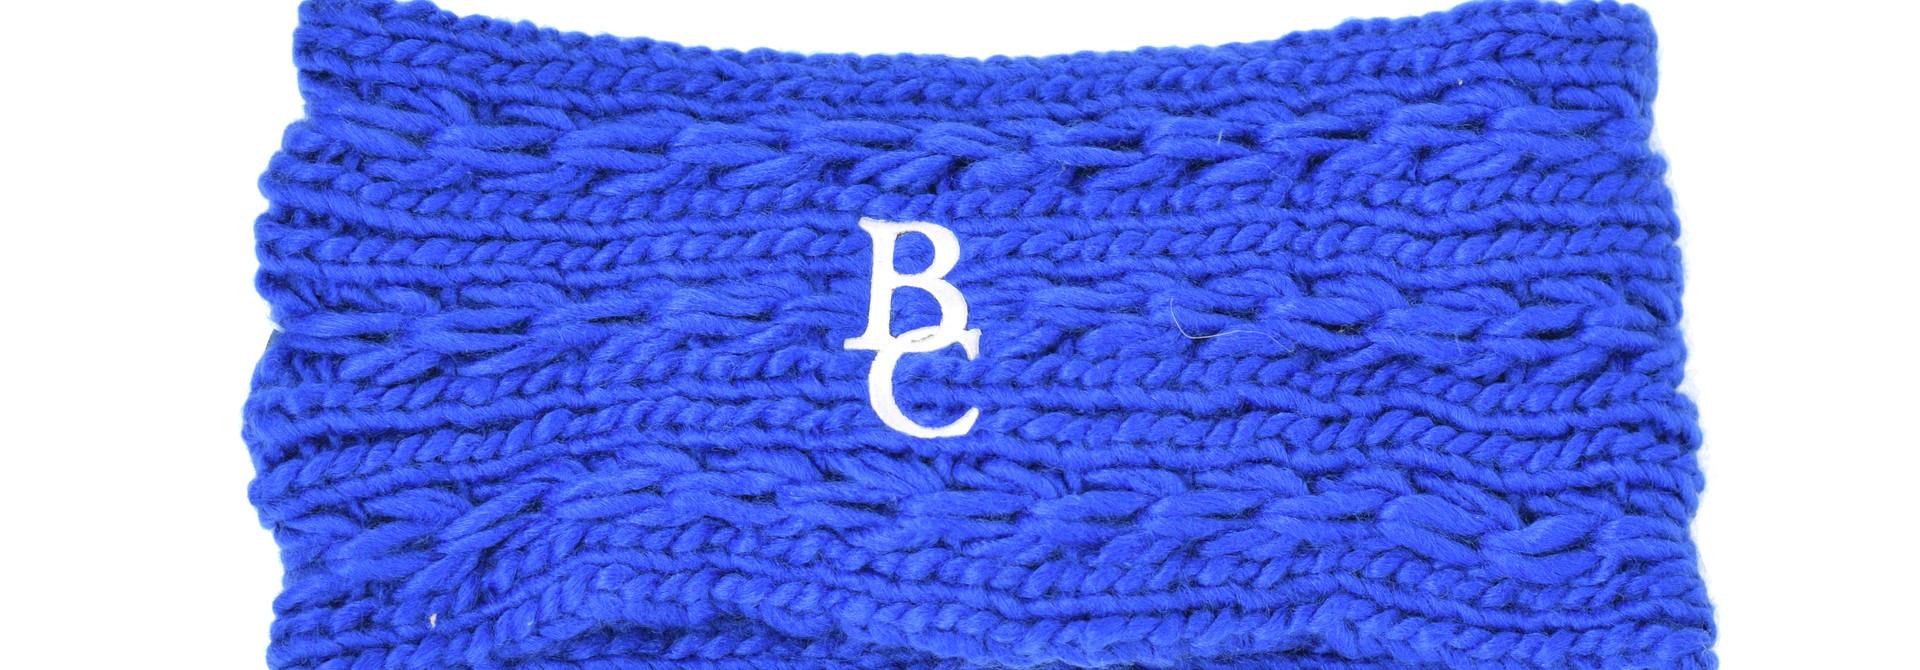 BC Knit Ear-Warmers